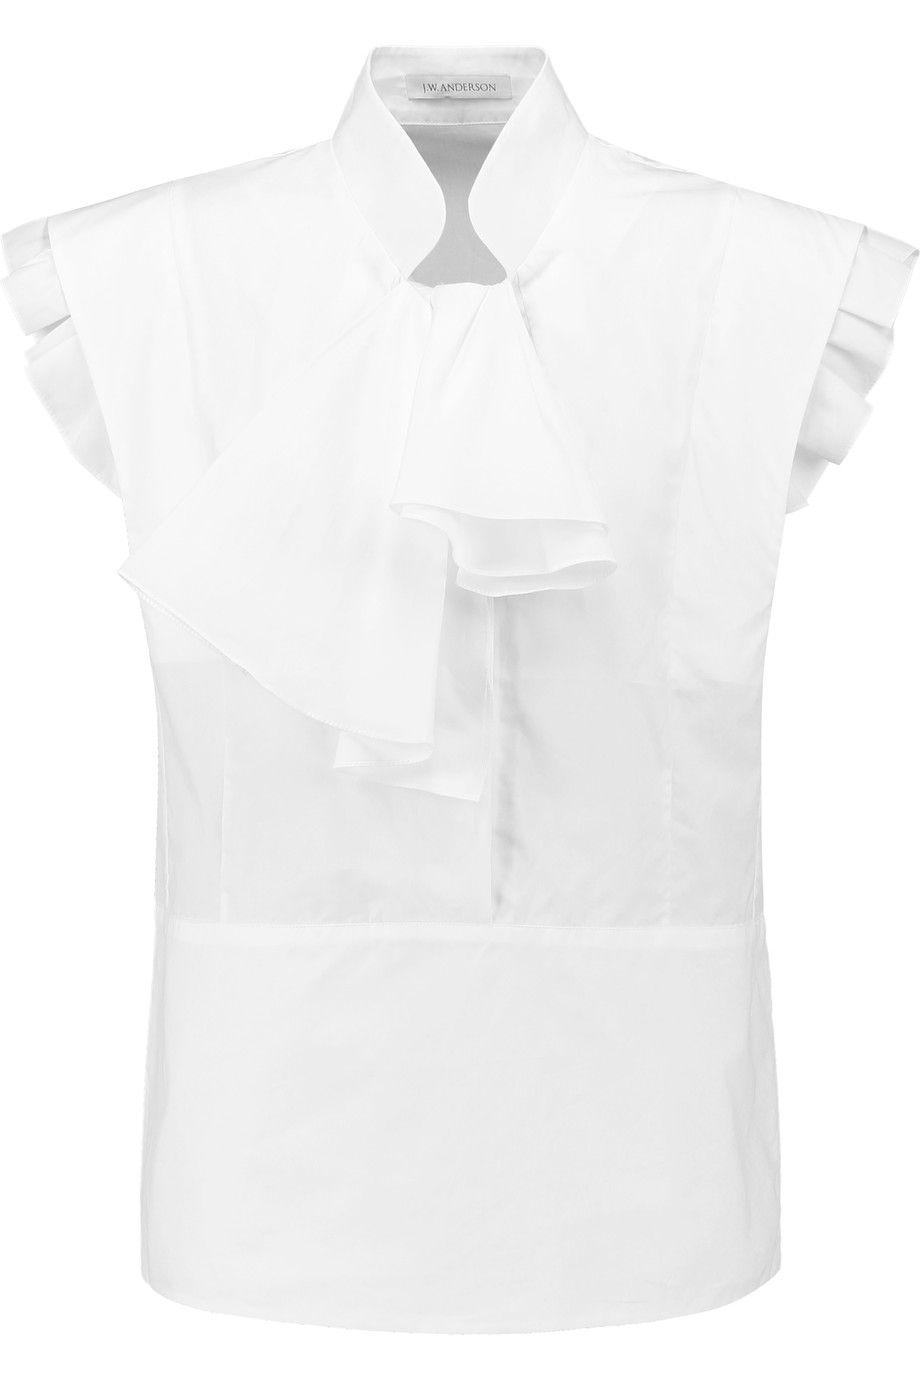 J.W.AndersonRuffled cotton-poplin shirt